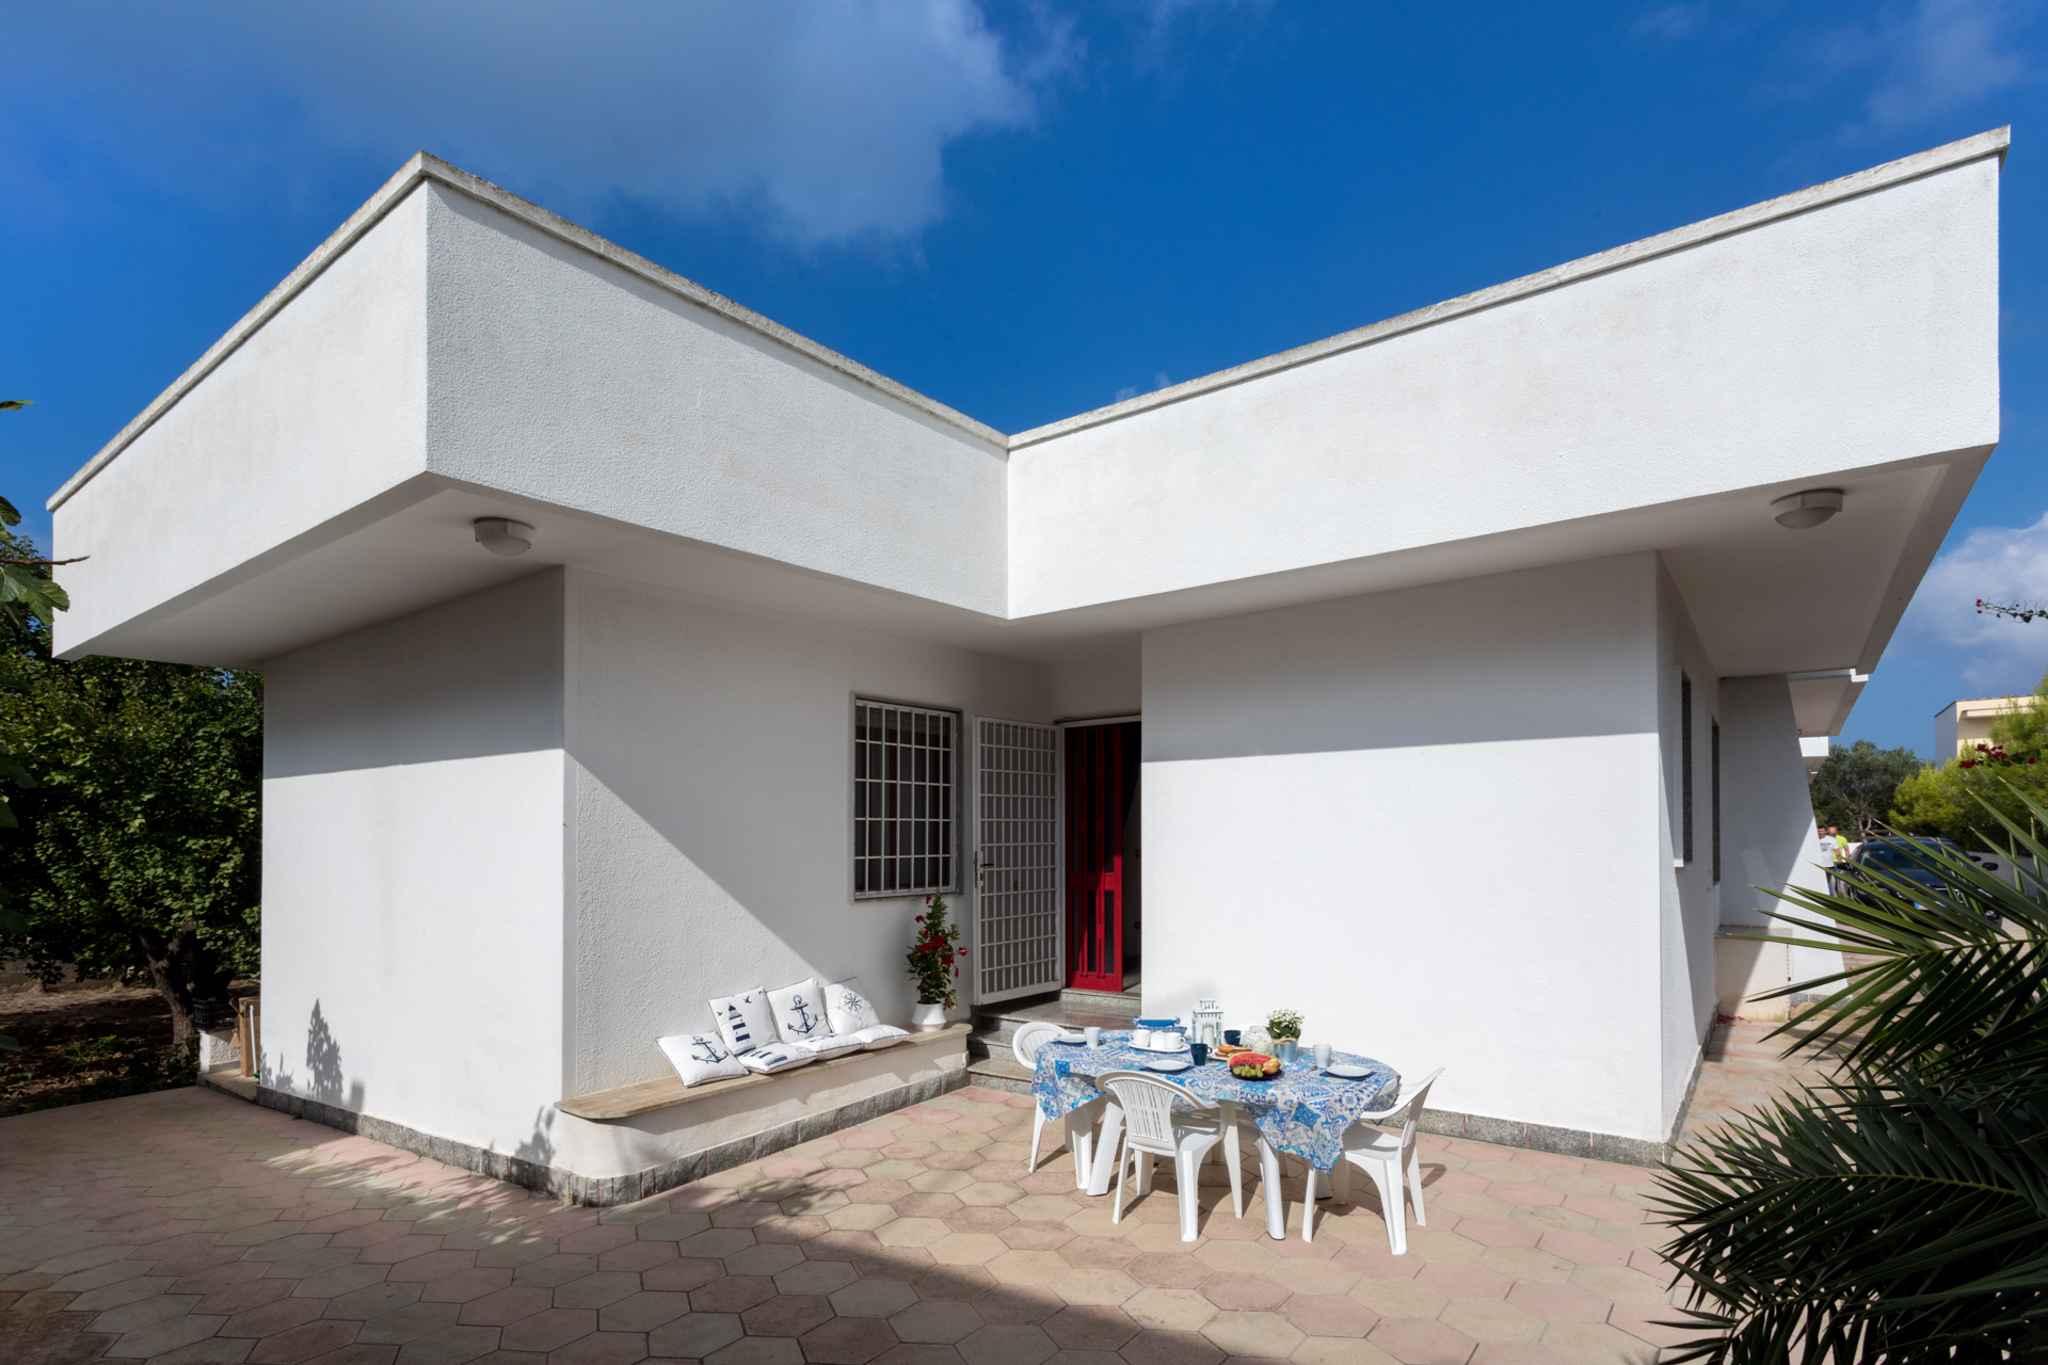 Ferienhaus Vicino Al Mare (560014), Alliste, Lecce, Apulien, Italien, Bild 1